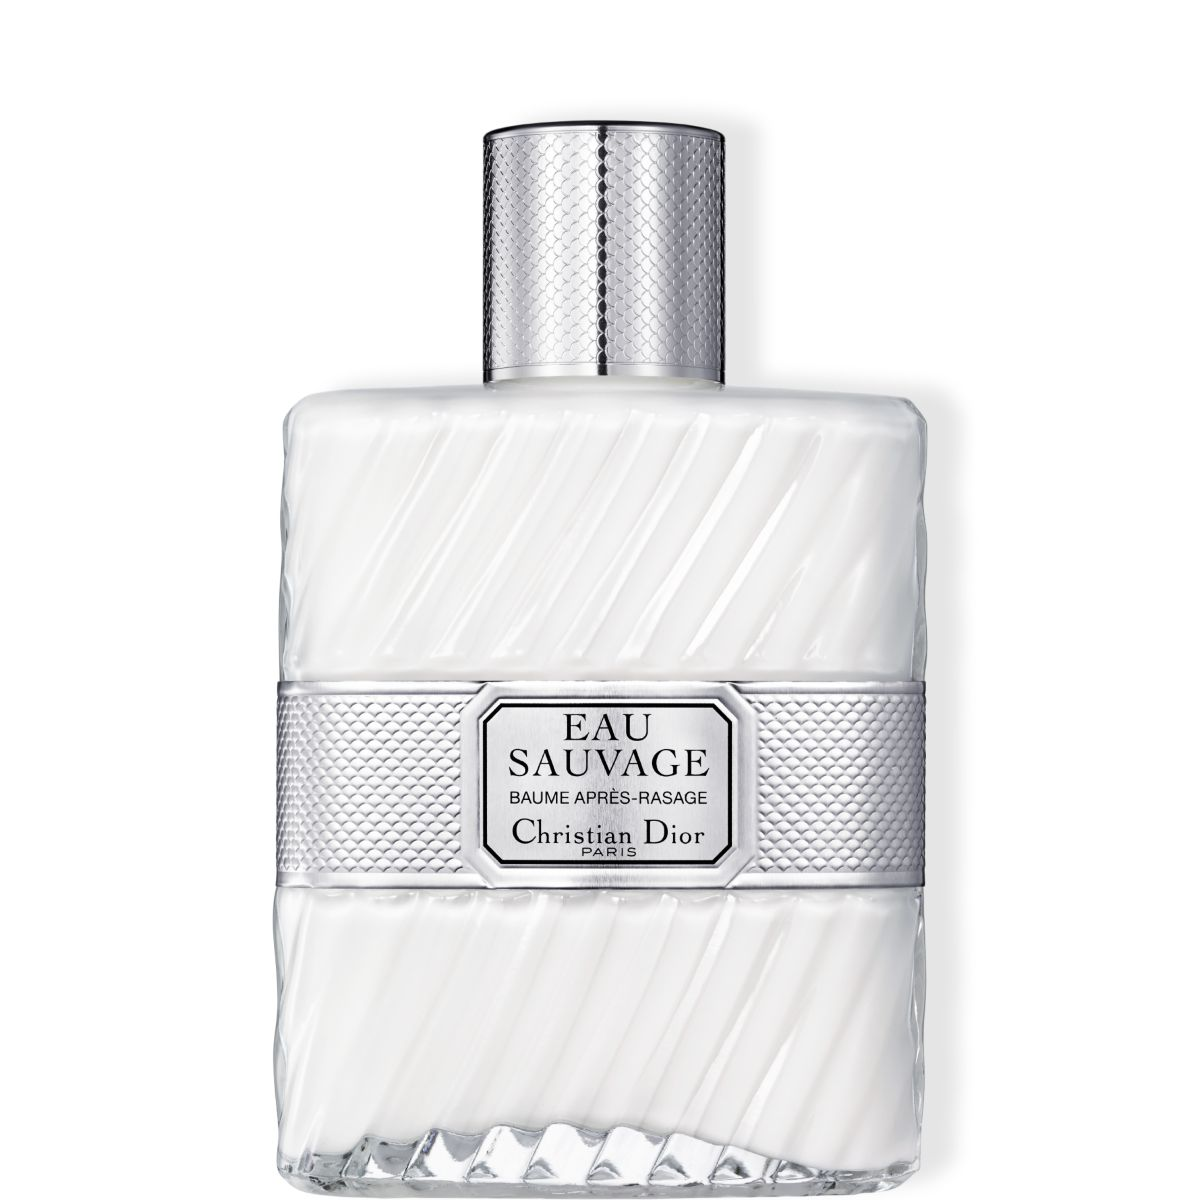 Dior - Eau Sauvage - Baume après-rasage 100 ml